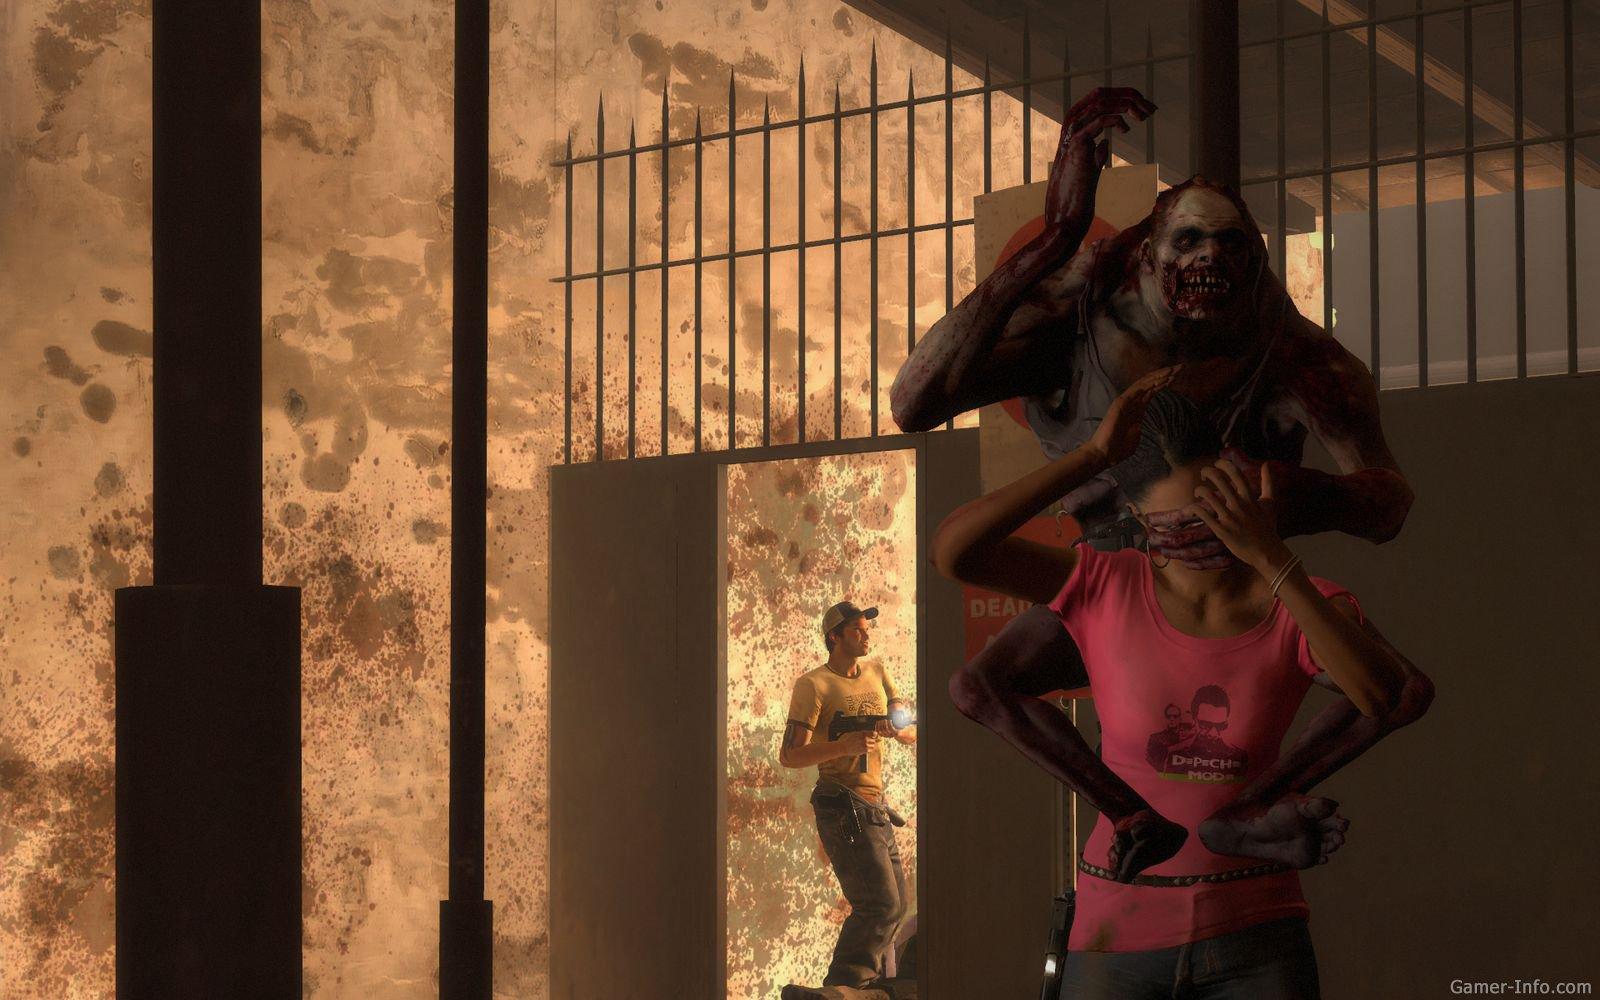 Left 4 Dead 2 (2009 video game)